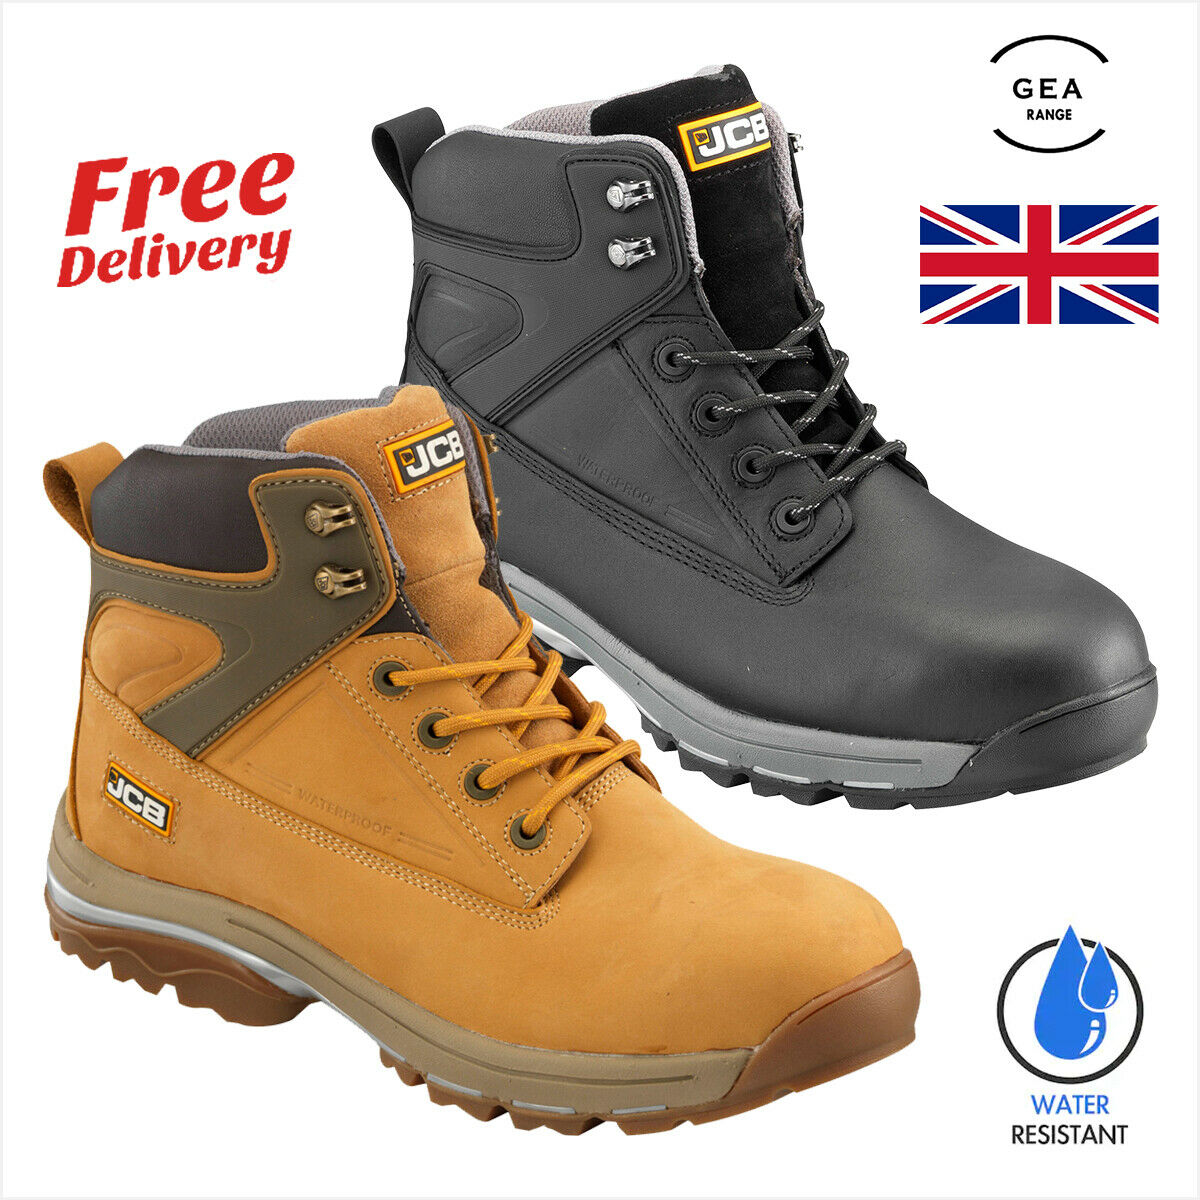 JCB UK Fast Track Safety Work Boots Men Steel Toe Cap Shoe Waterproof Protection